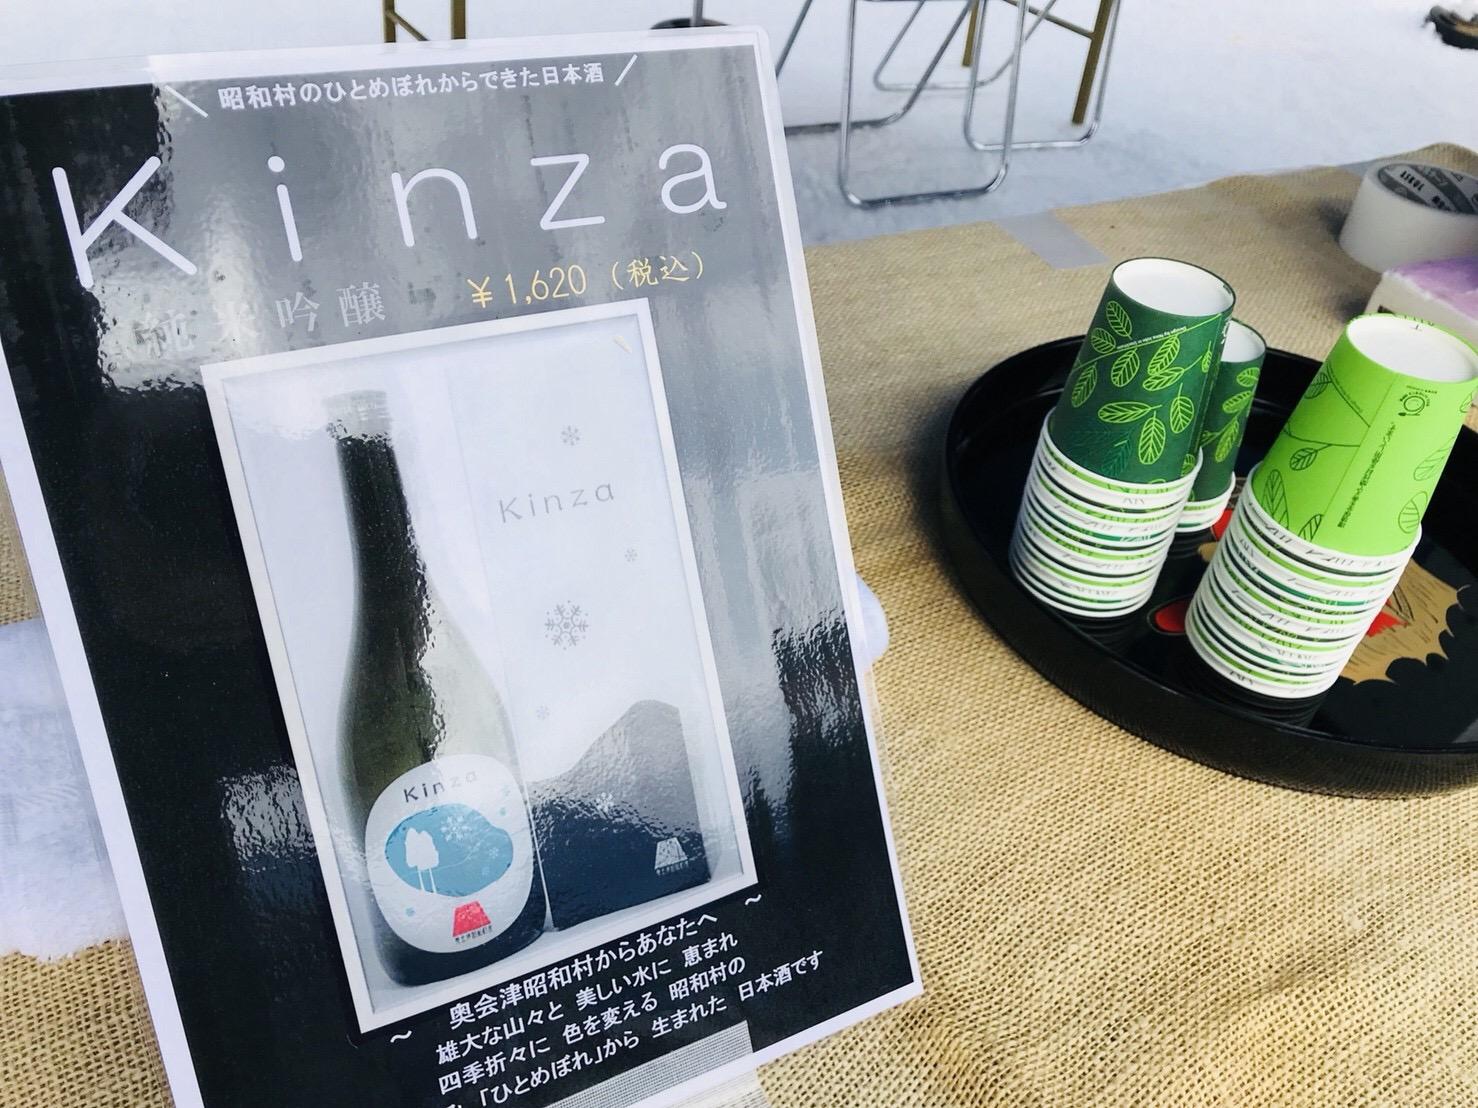 昭和村 kinza